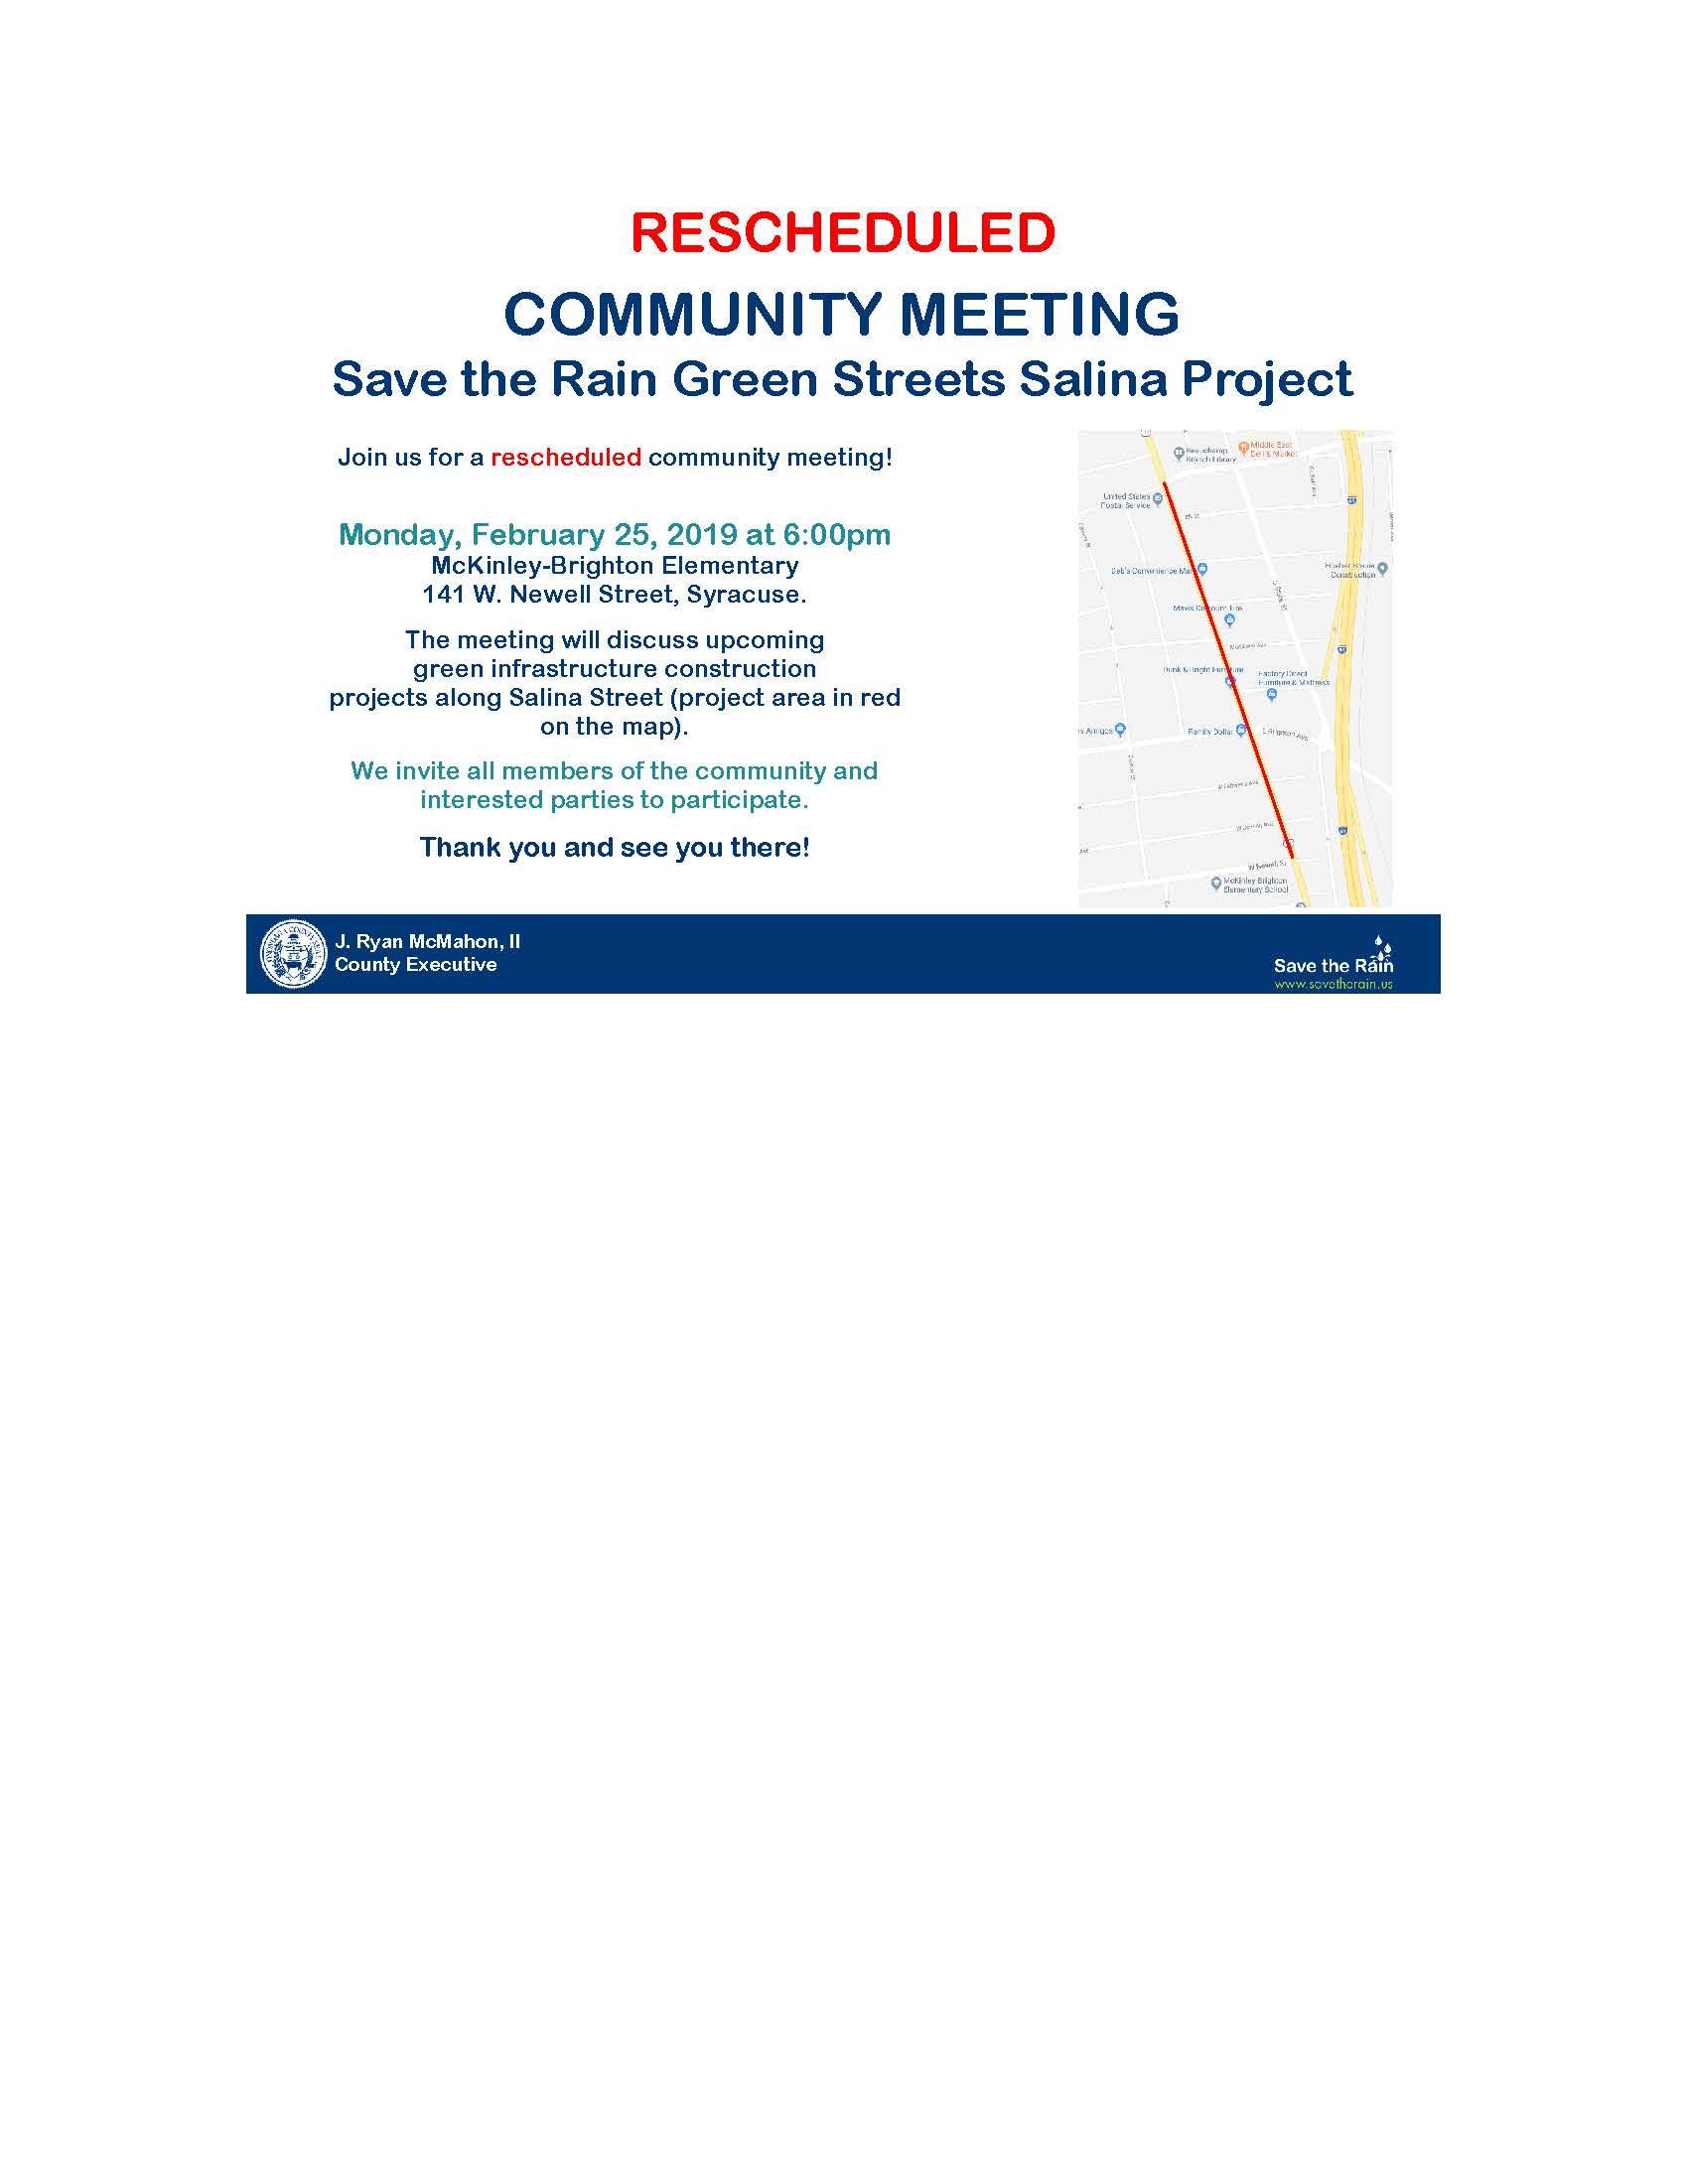 Salina Green Street Community Meeting 1 RESCHEDULE Notice.jpg